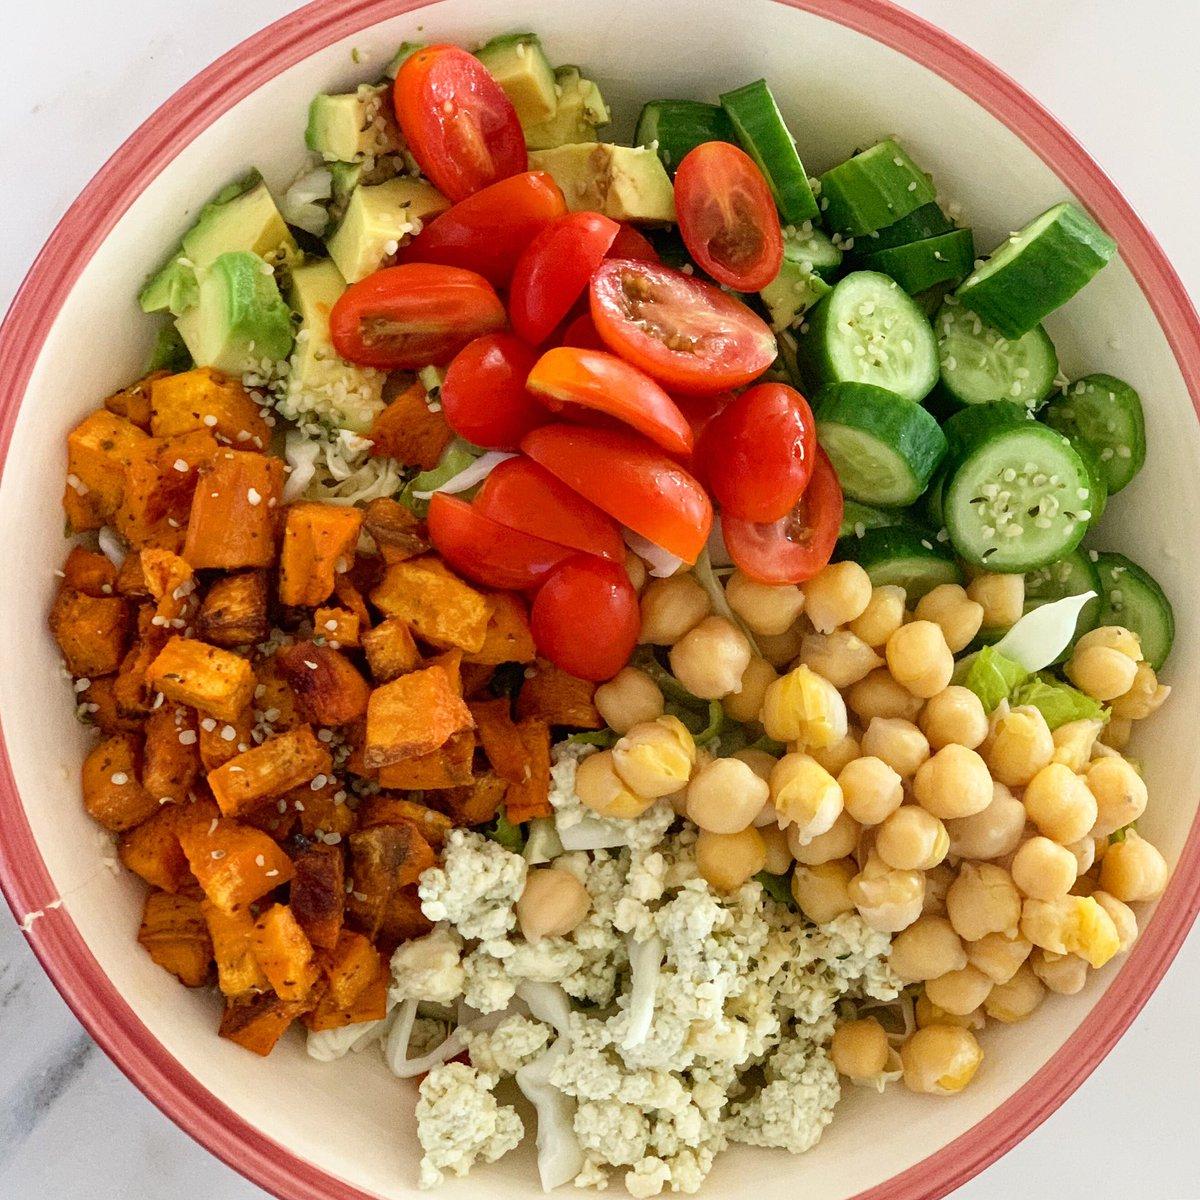 Eat your rainbow ???? https://t.co/GiRBYeIvzN